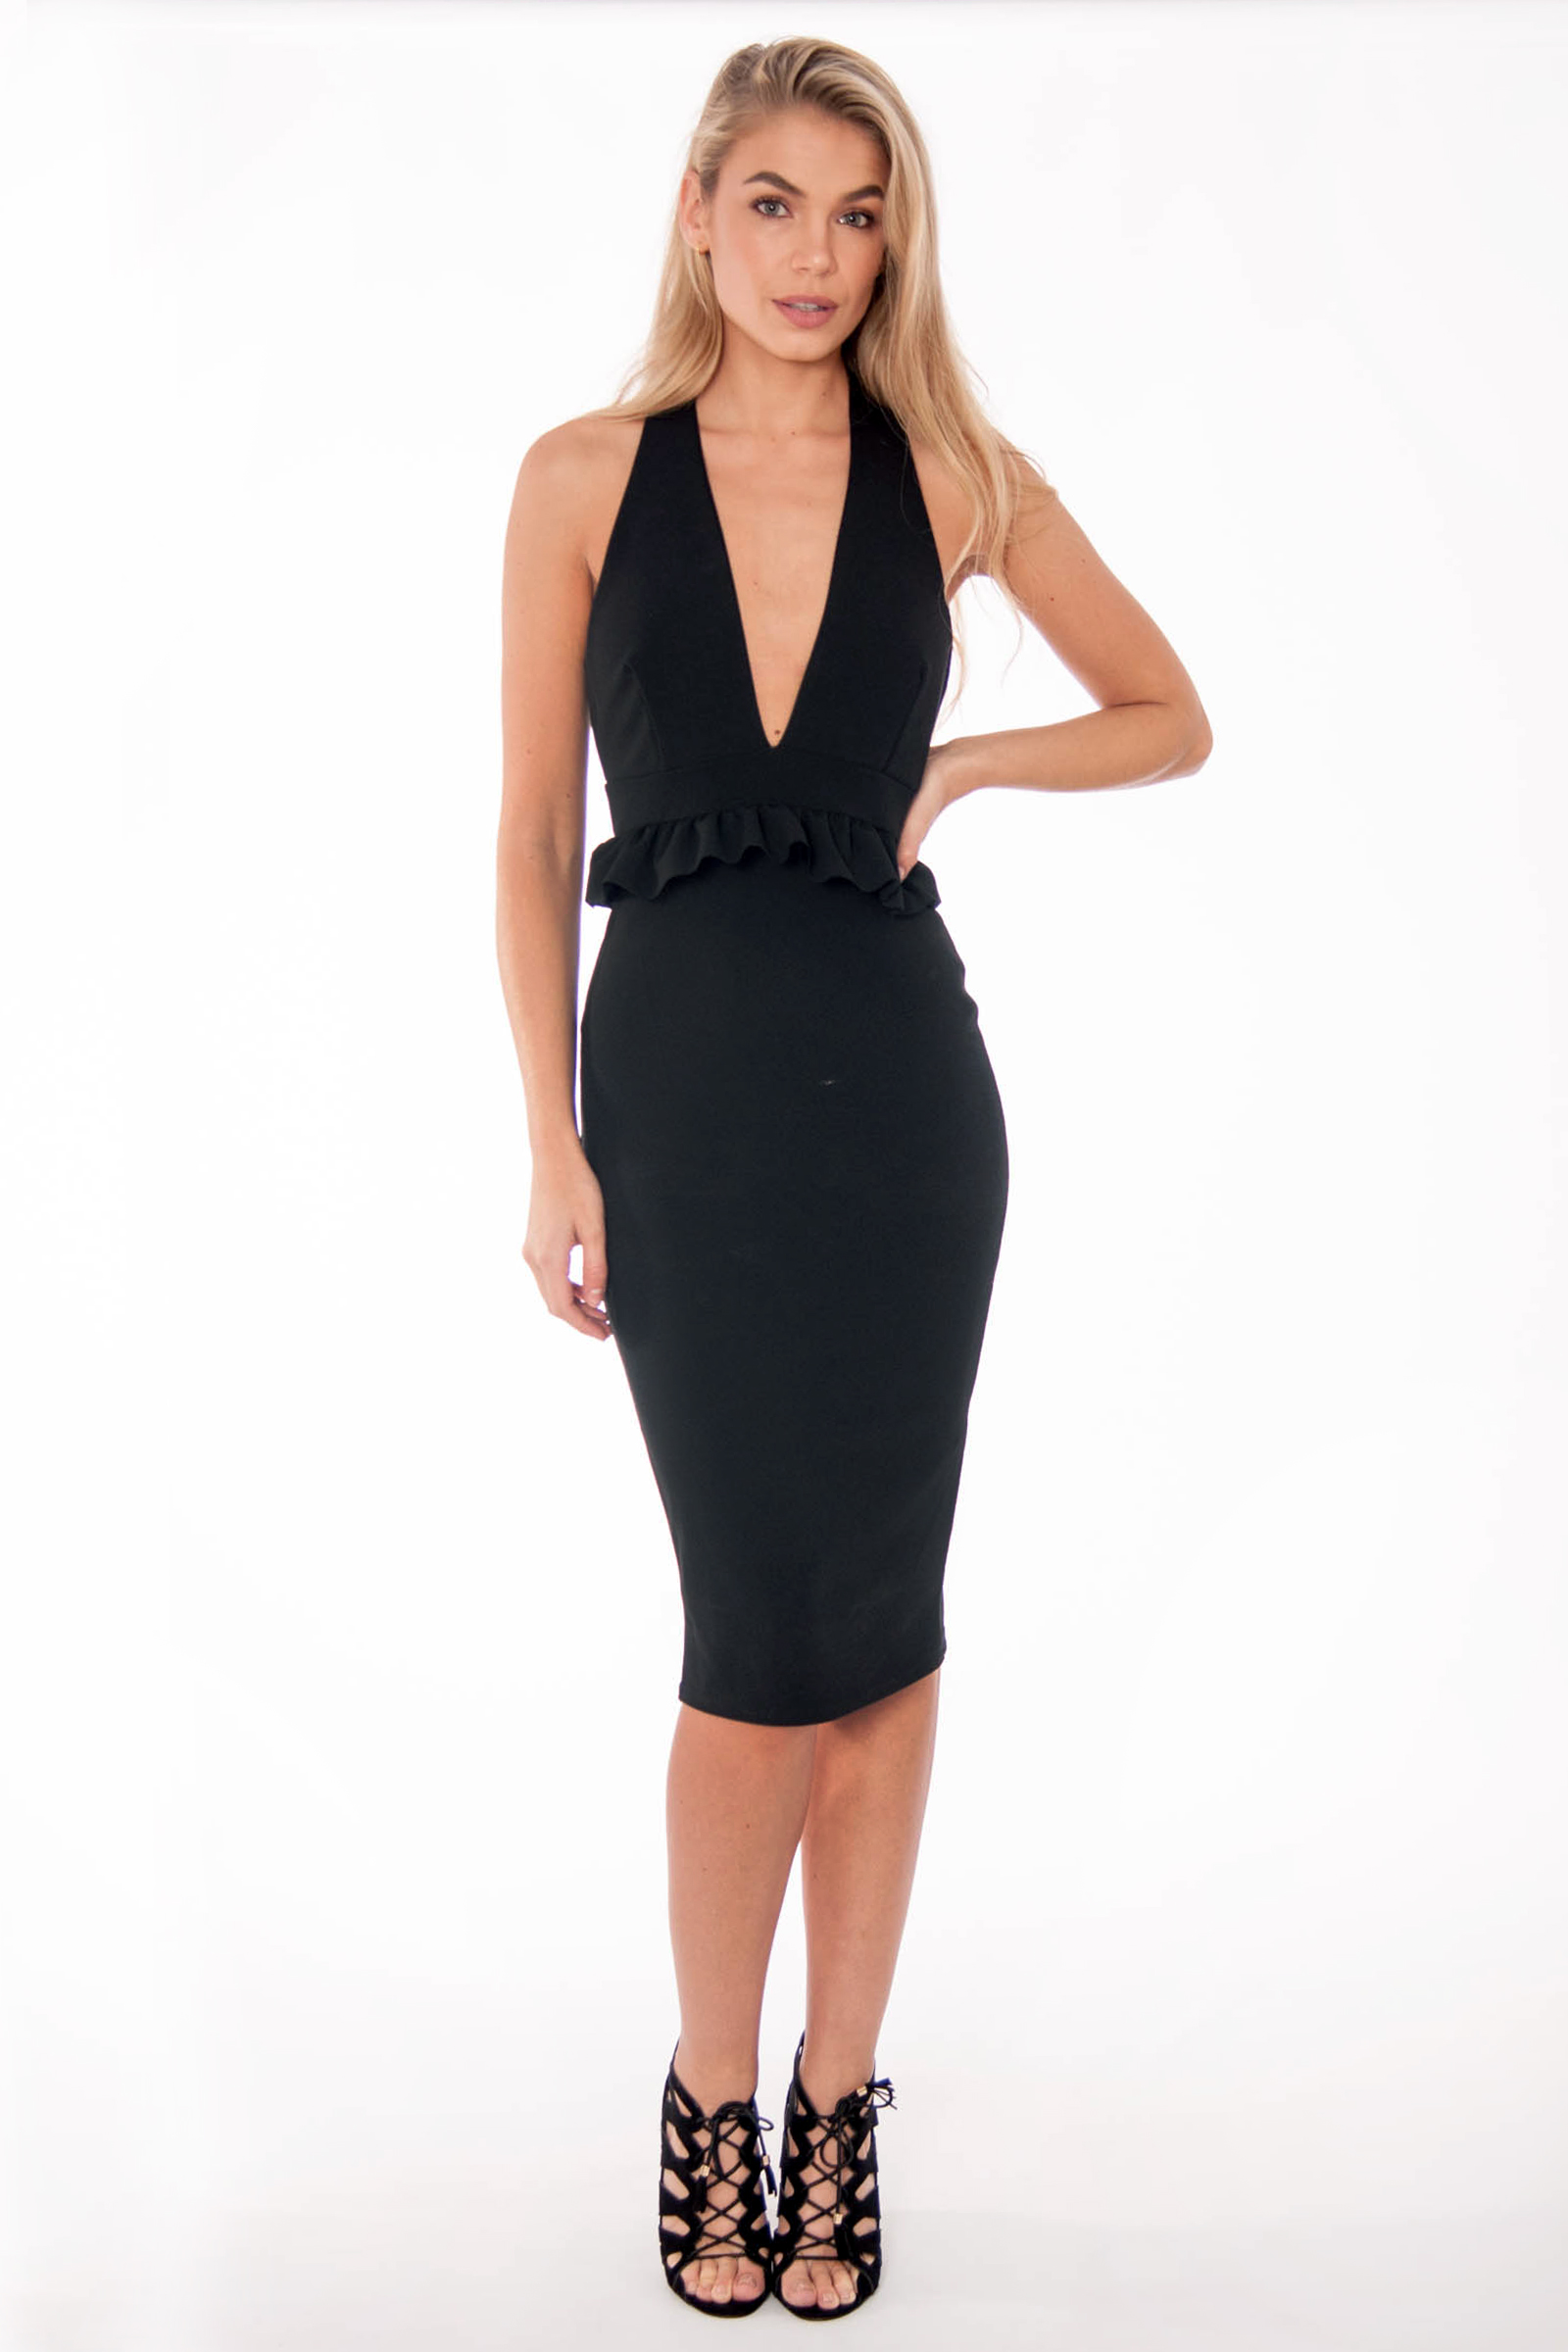 Black Halter Neck Ruffle Dress | Party